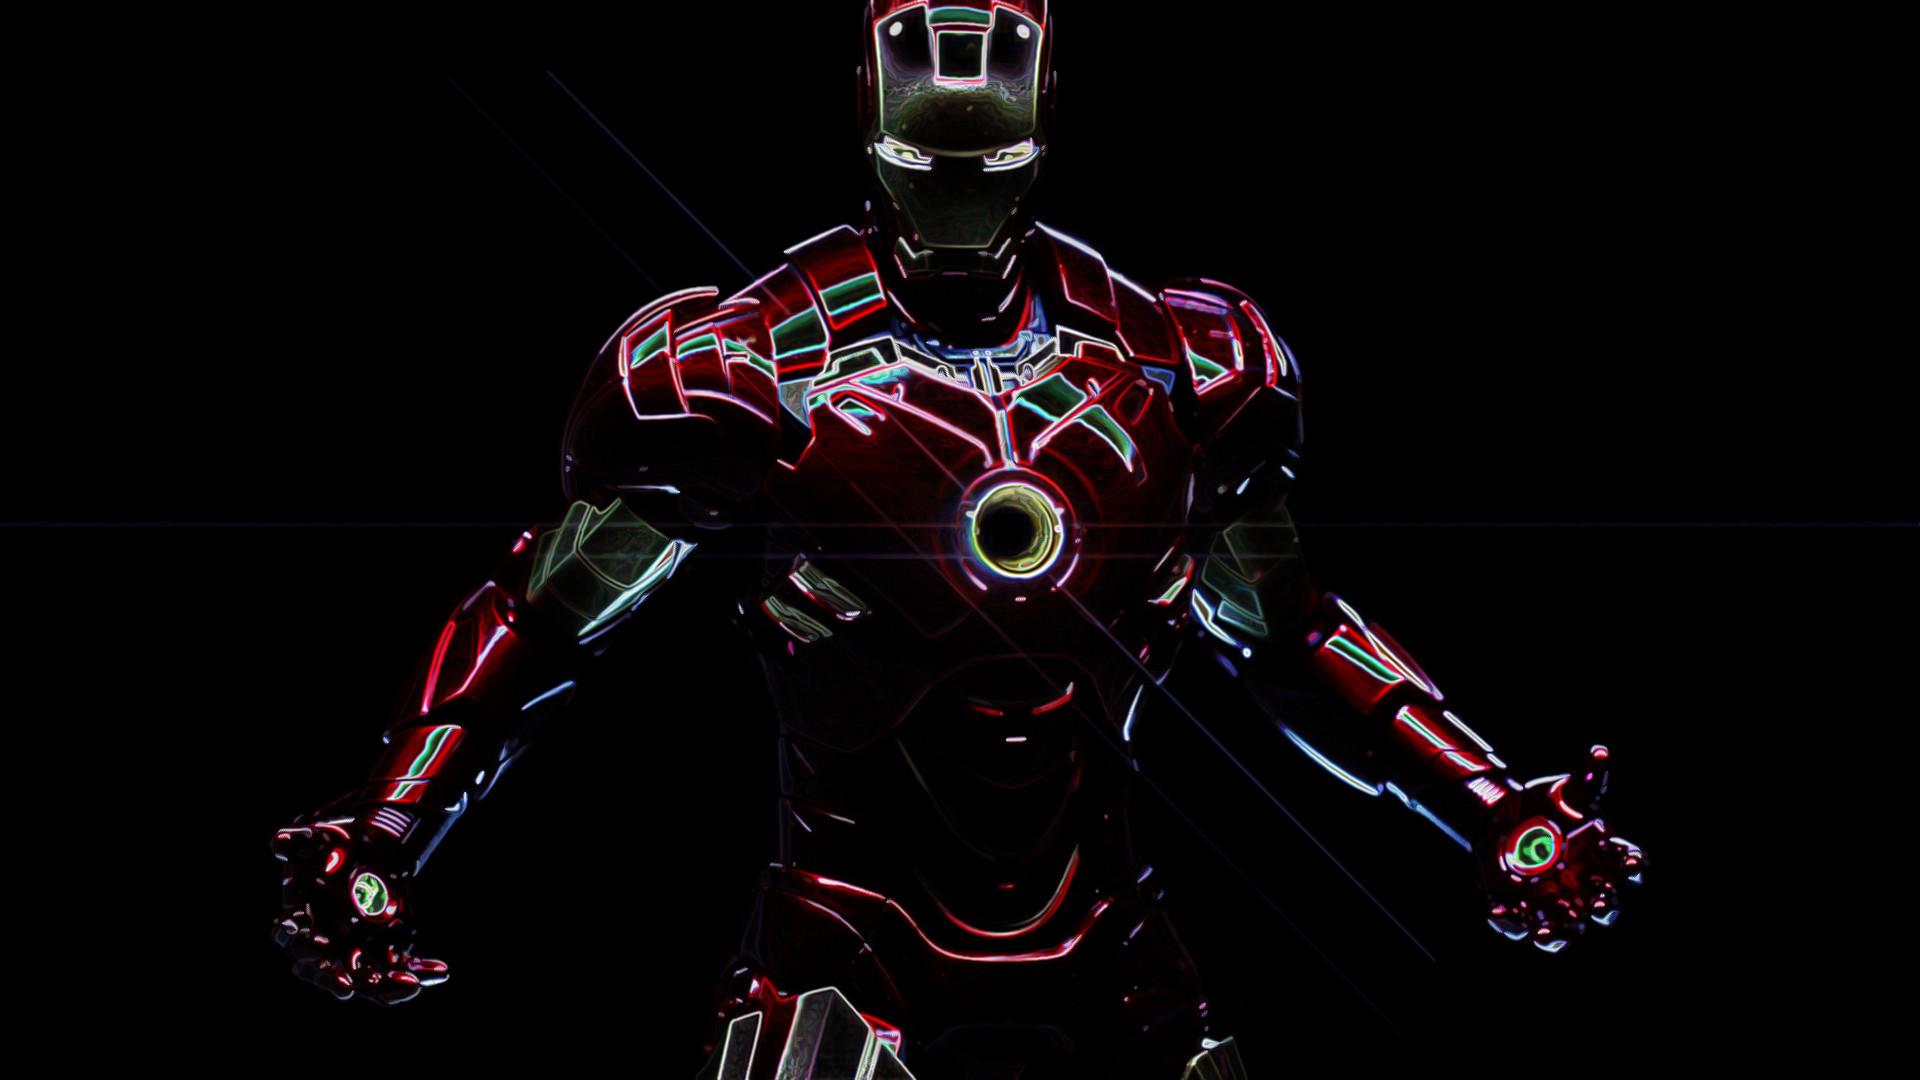 3d My Name Live Wallpaper Apk Download Iron Man Jarvis Live Wallpaper 78 Images